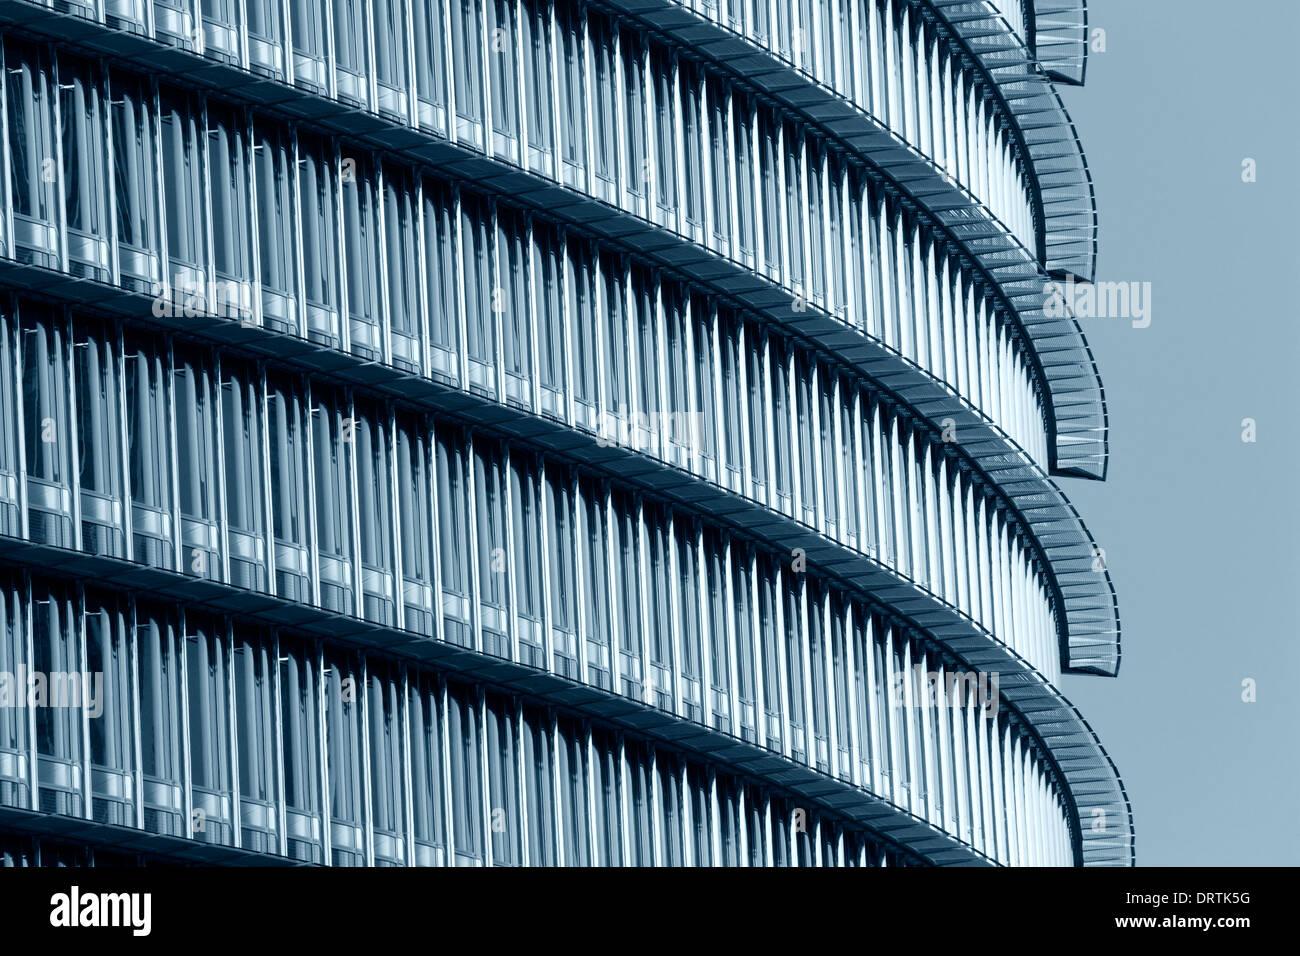 Modern architecture. Burj Khalifa, Dubai. - Stock Image